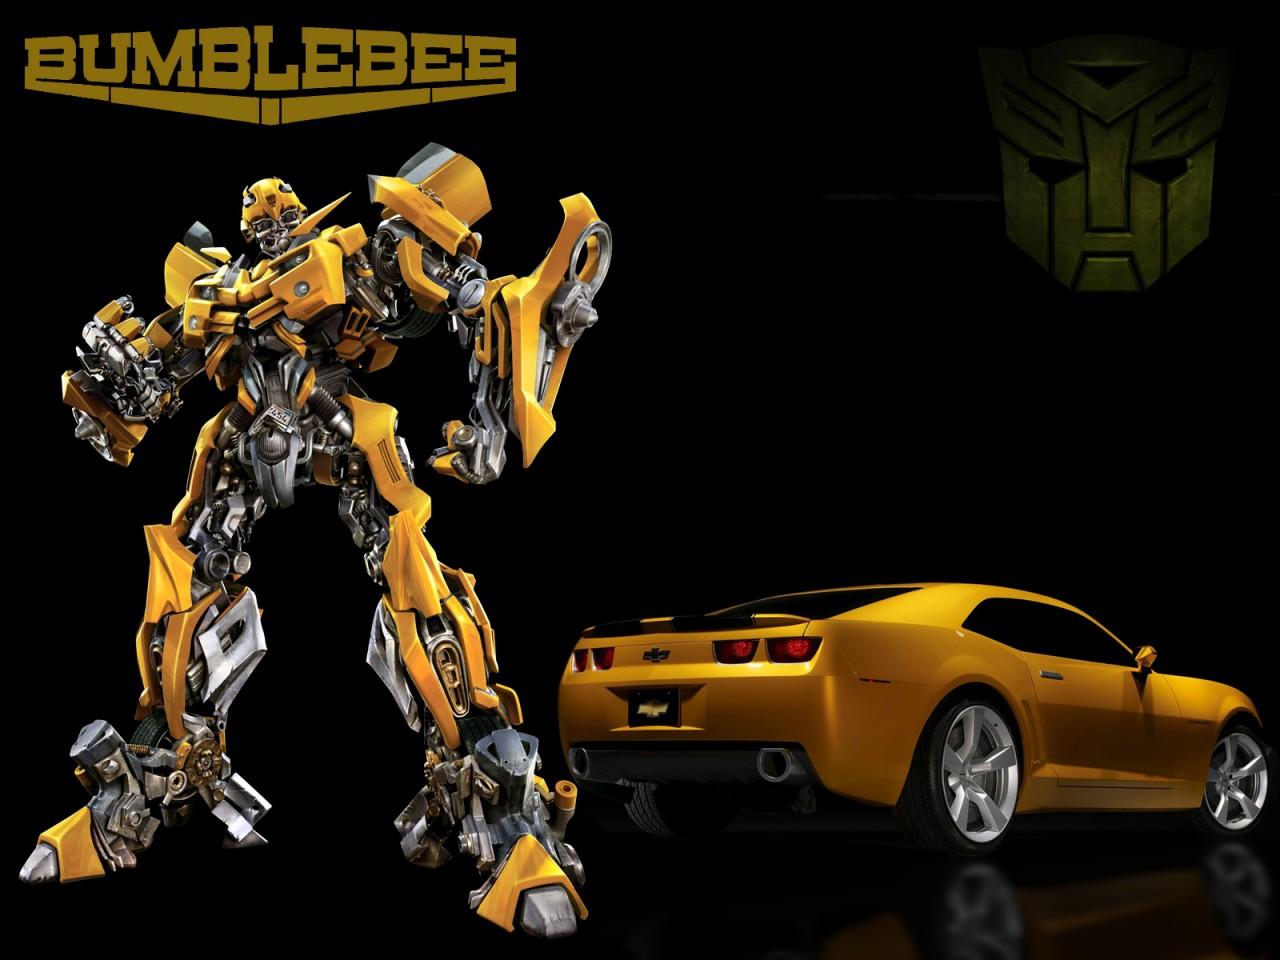 Download hd bumblebee transformers wallpaper HD wallpaper 1280x960